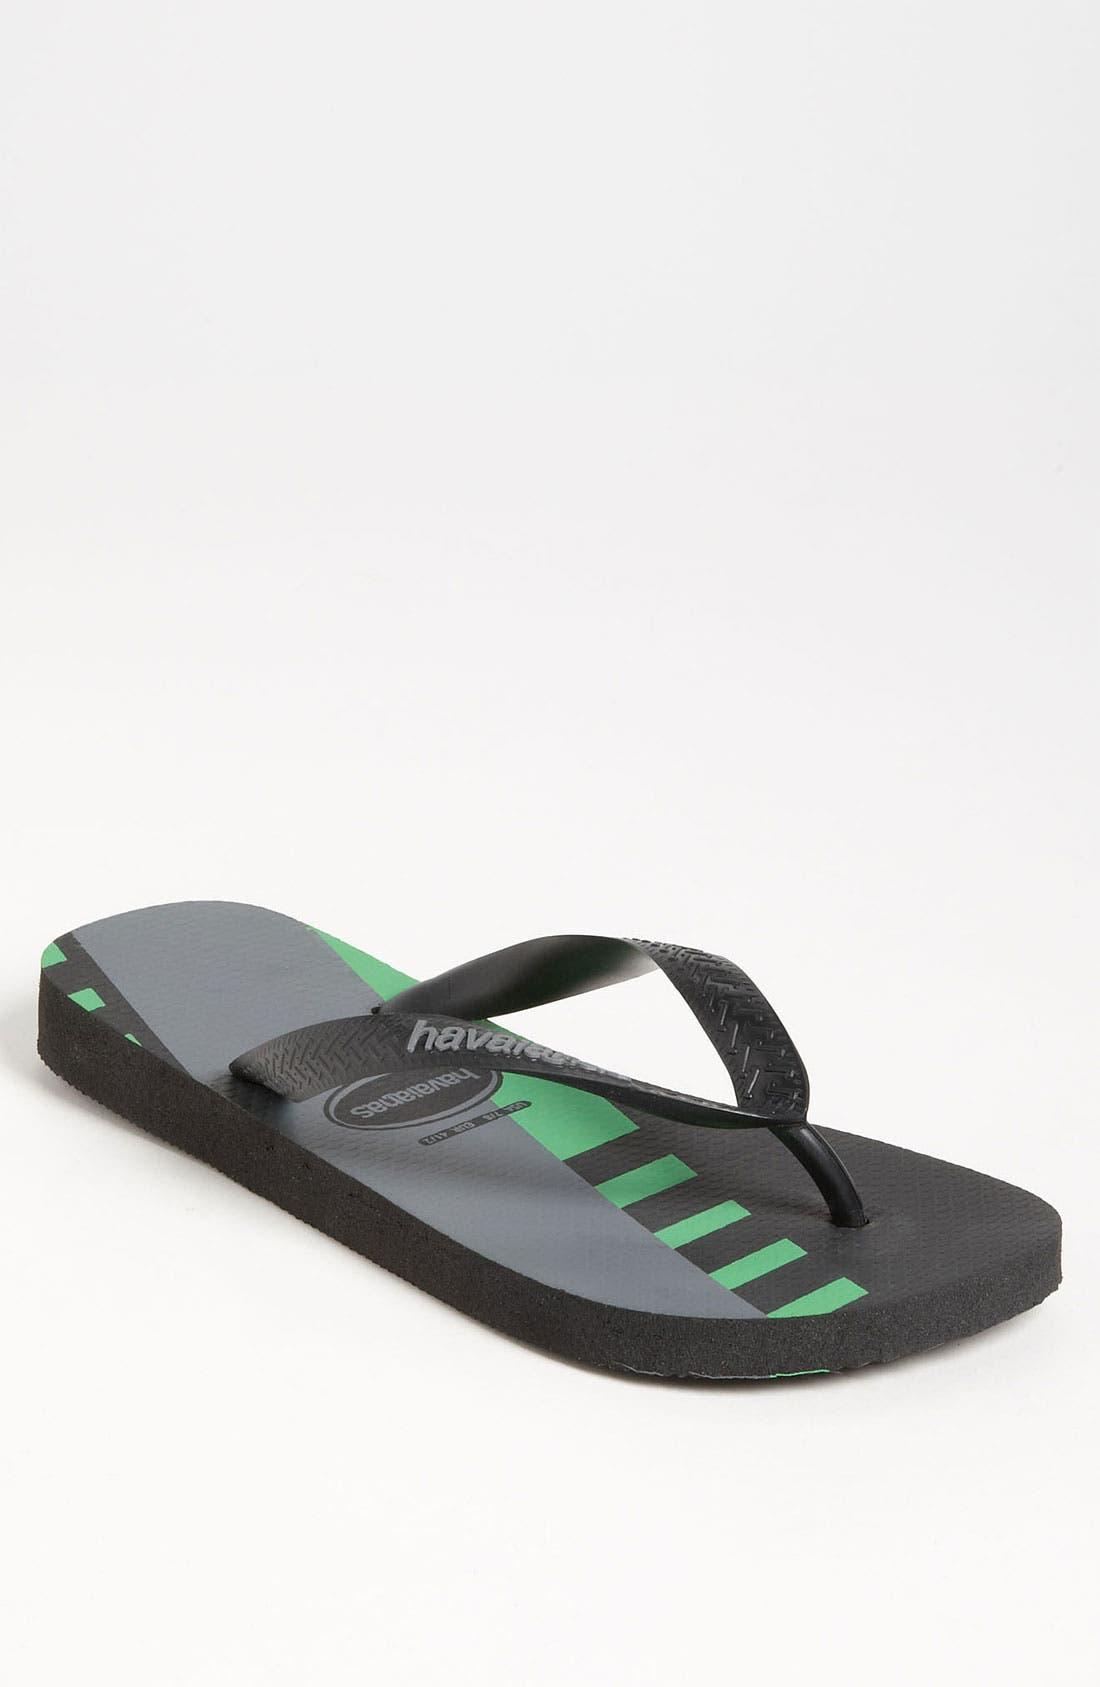 Main Image - Havaianas TREND Mens Flip Flop